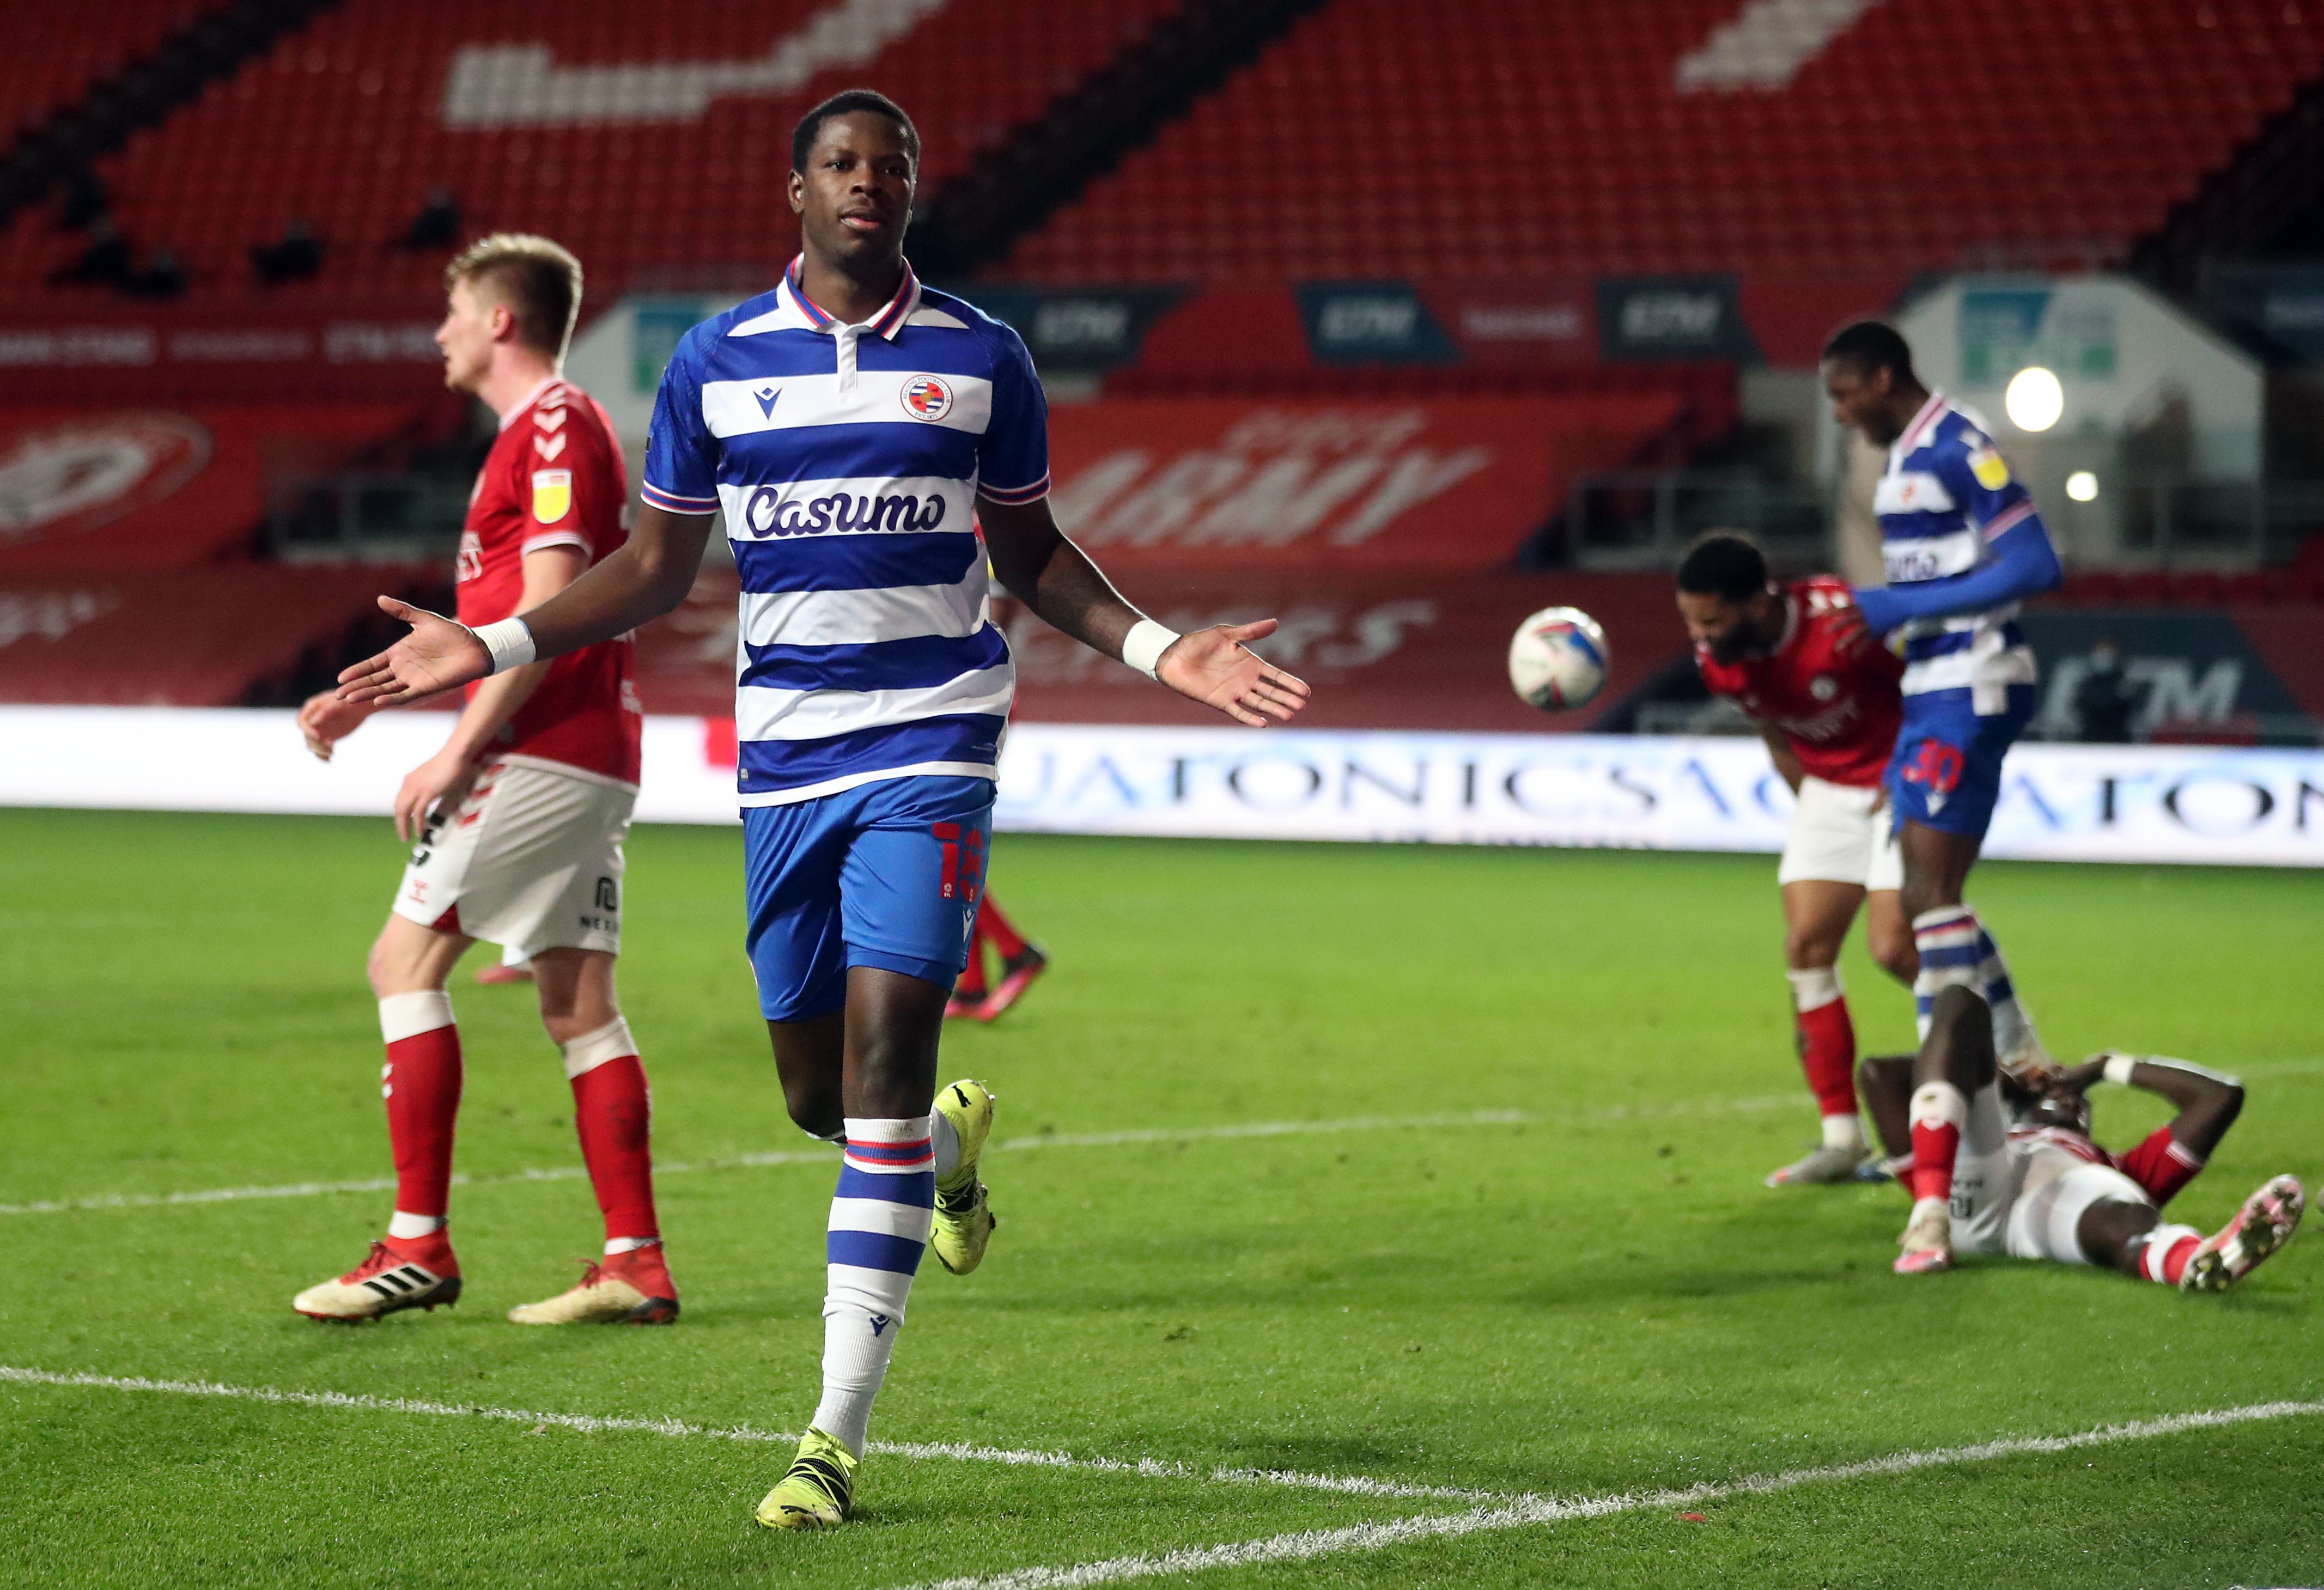 Bristol City v Reading - Sky Bet Championship - Ashton Gate